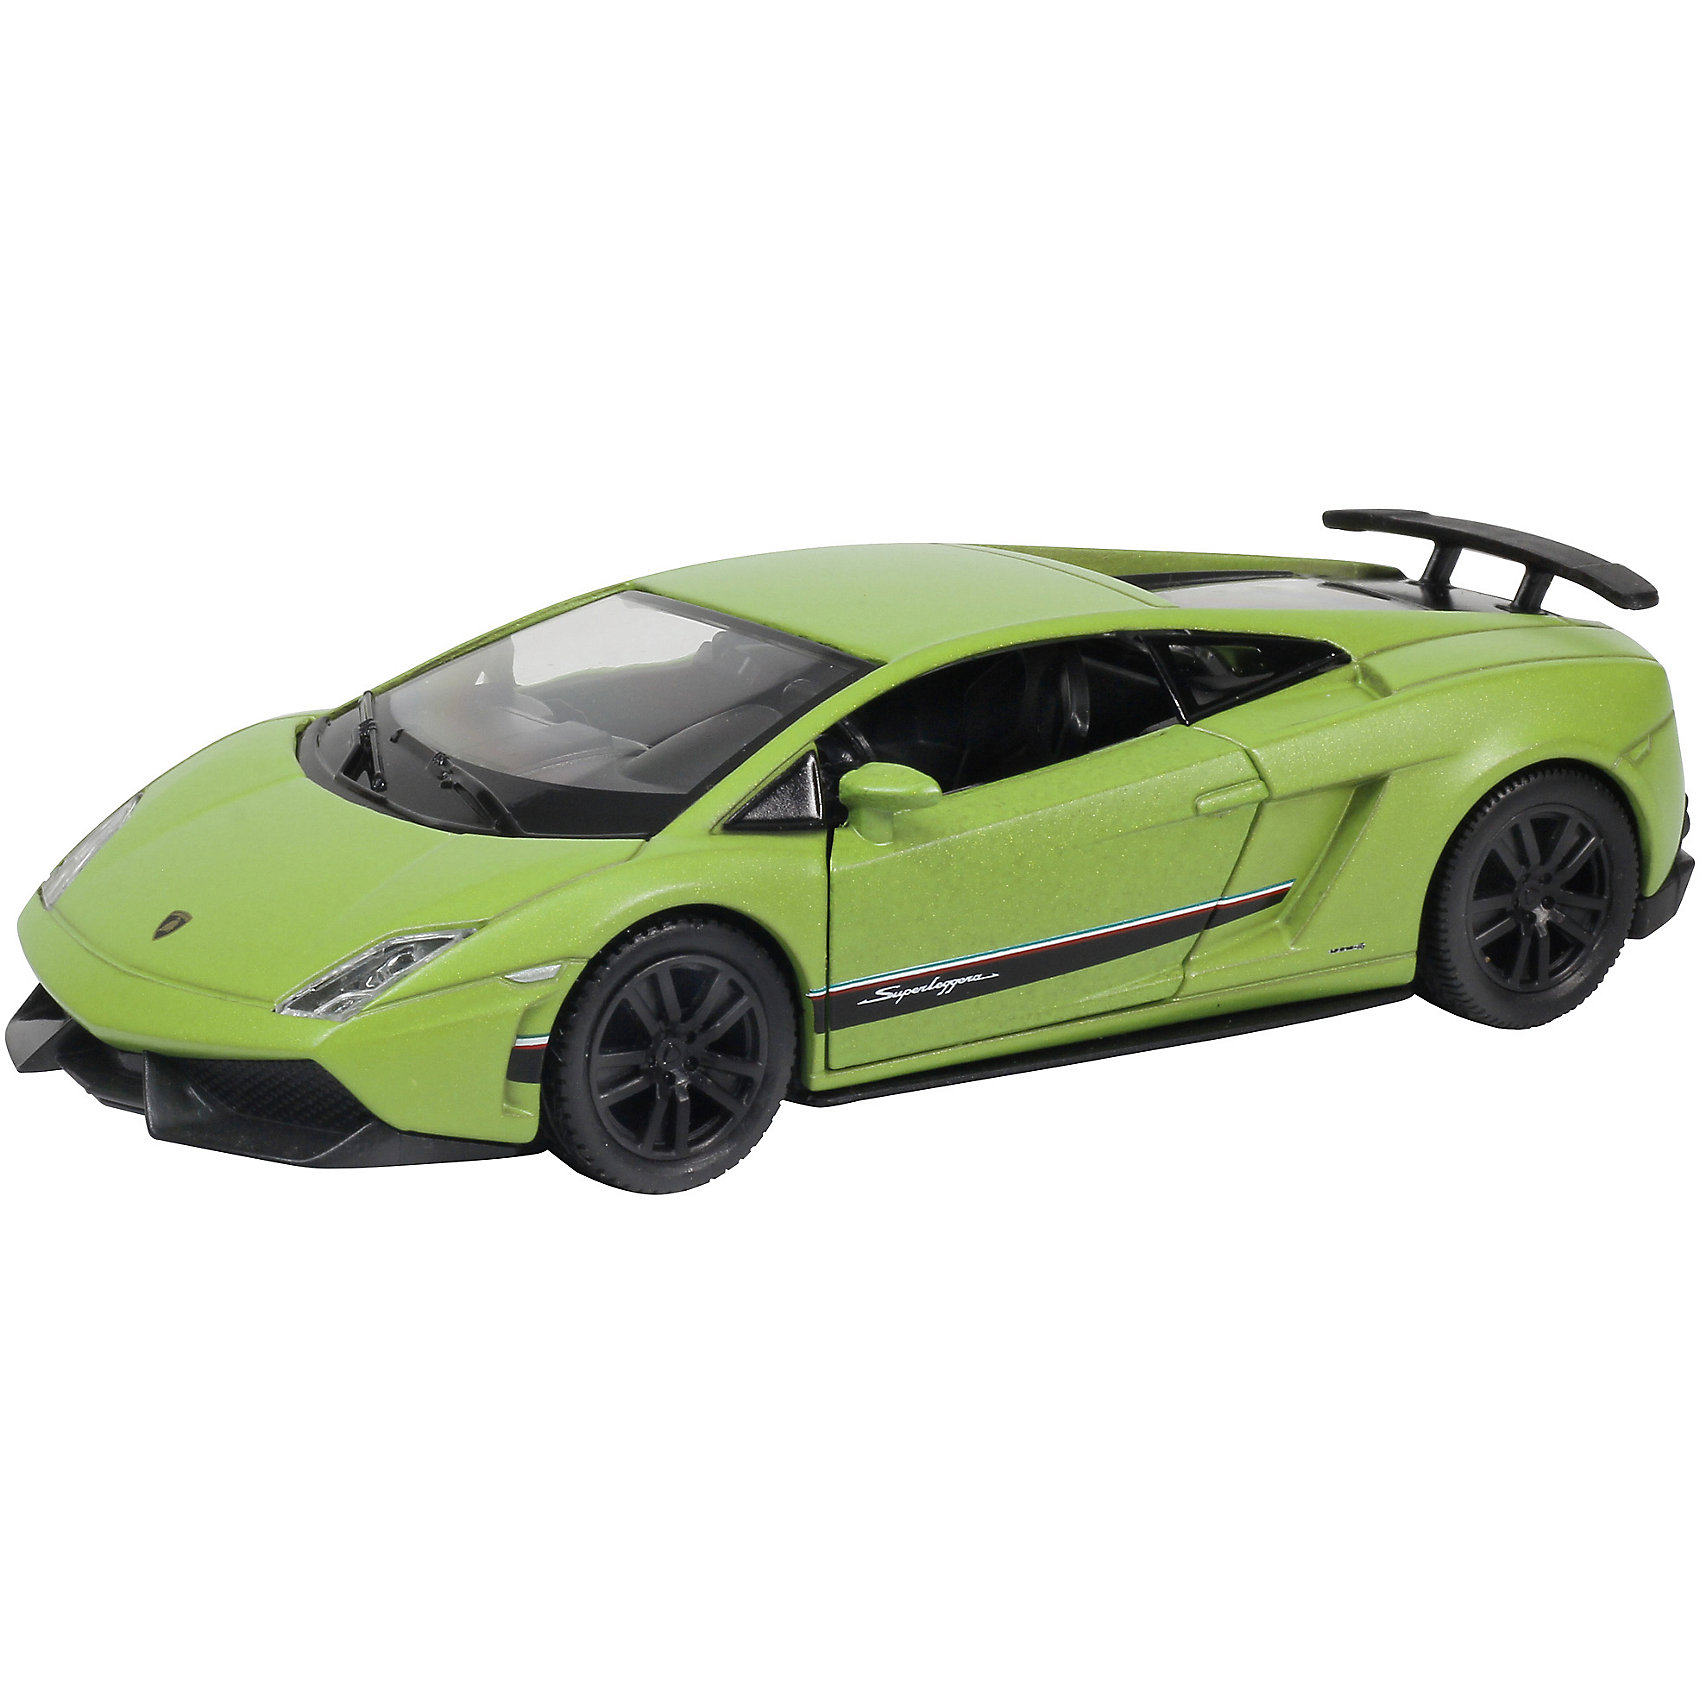 KRUTTI Машинка Lamborghini Gallardo, KRUTTI купить швейно вышивальную машинку бразер 950